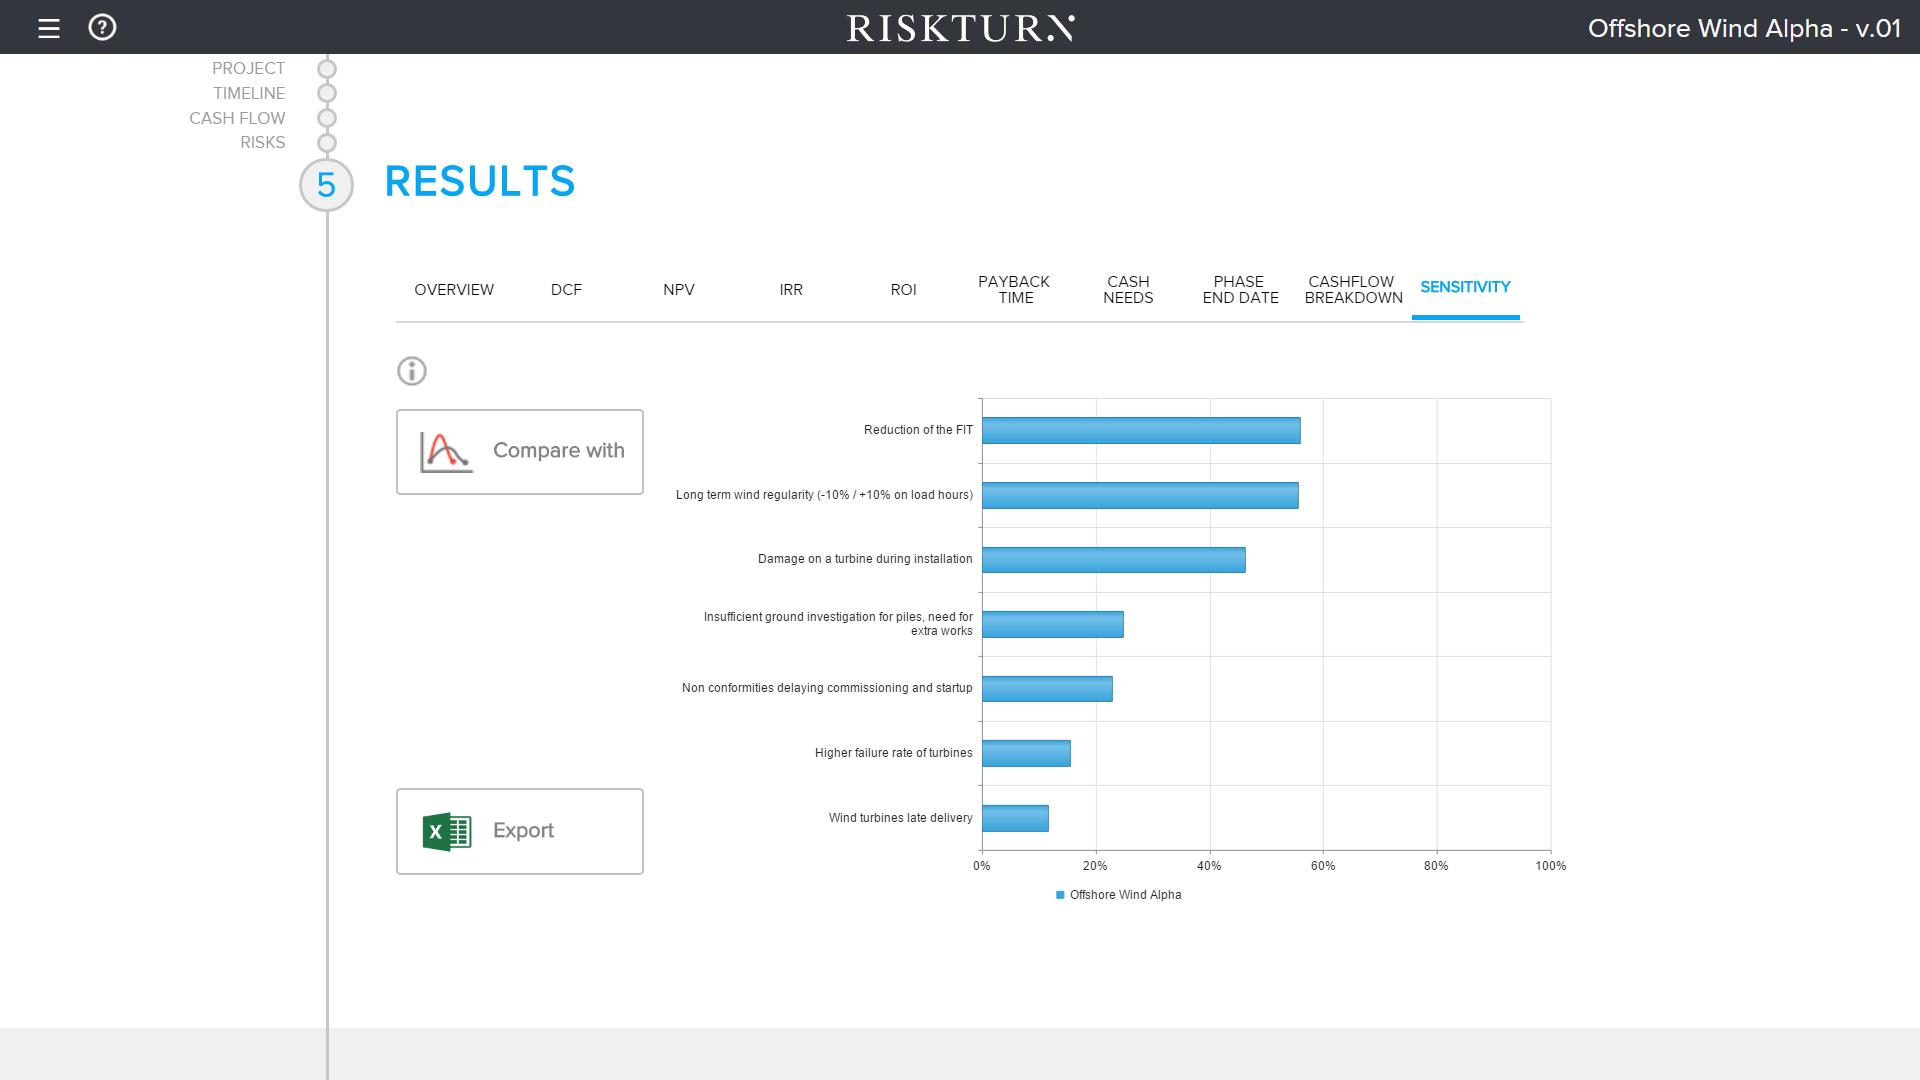 RISKTURN Software - Sensitivity forecasting